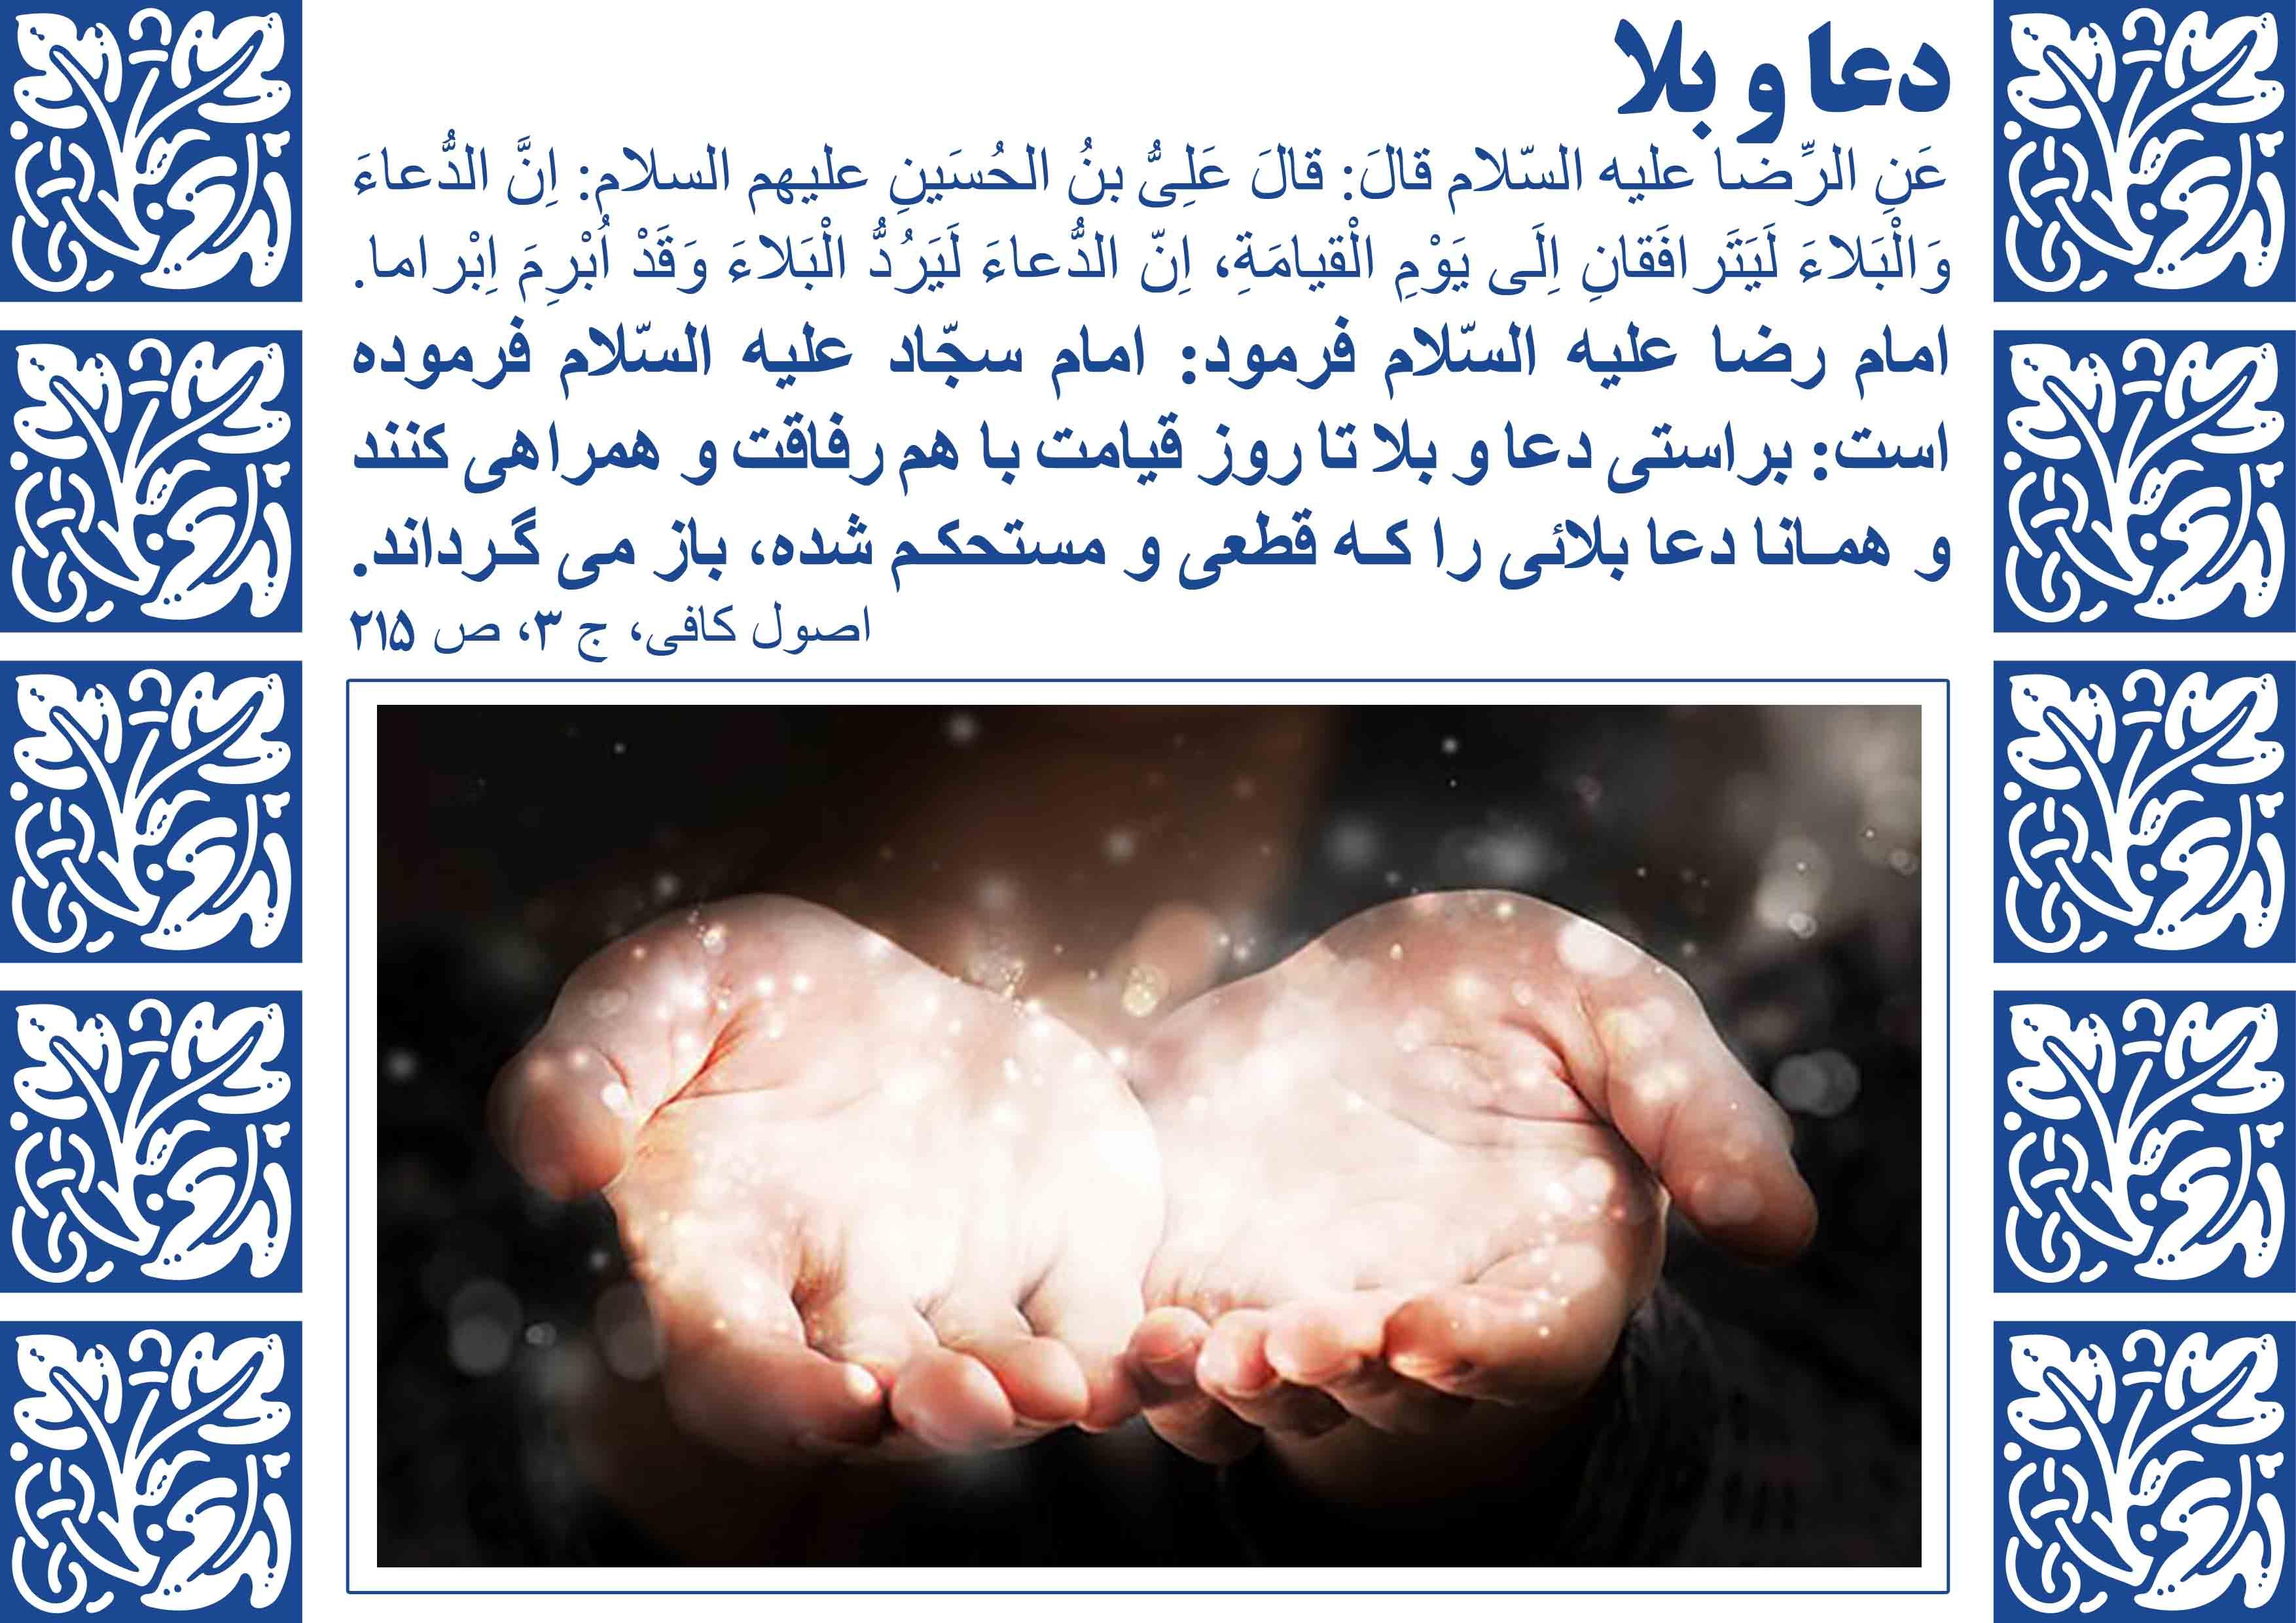 دعا و بلا